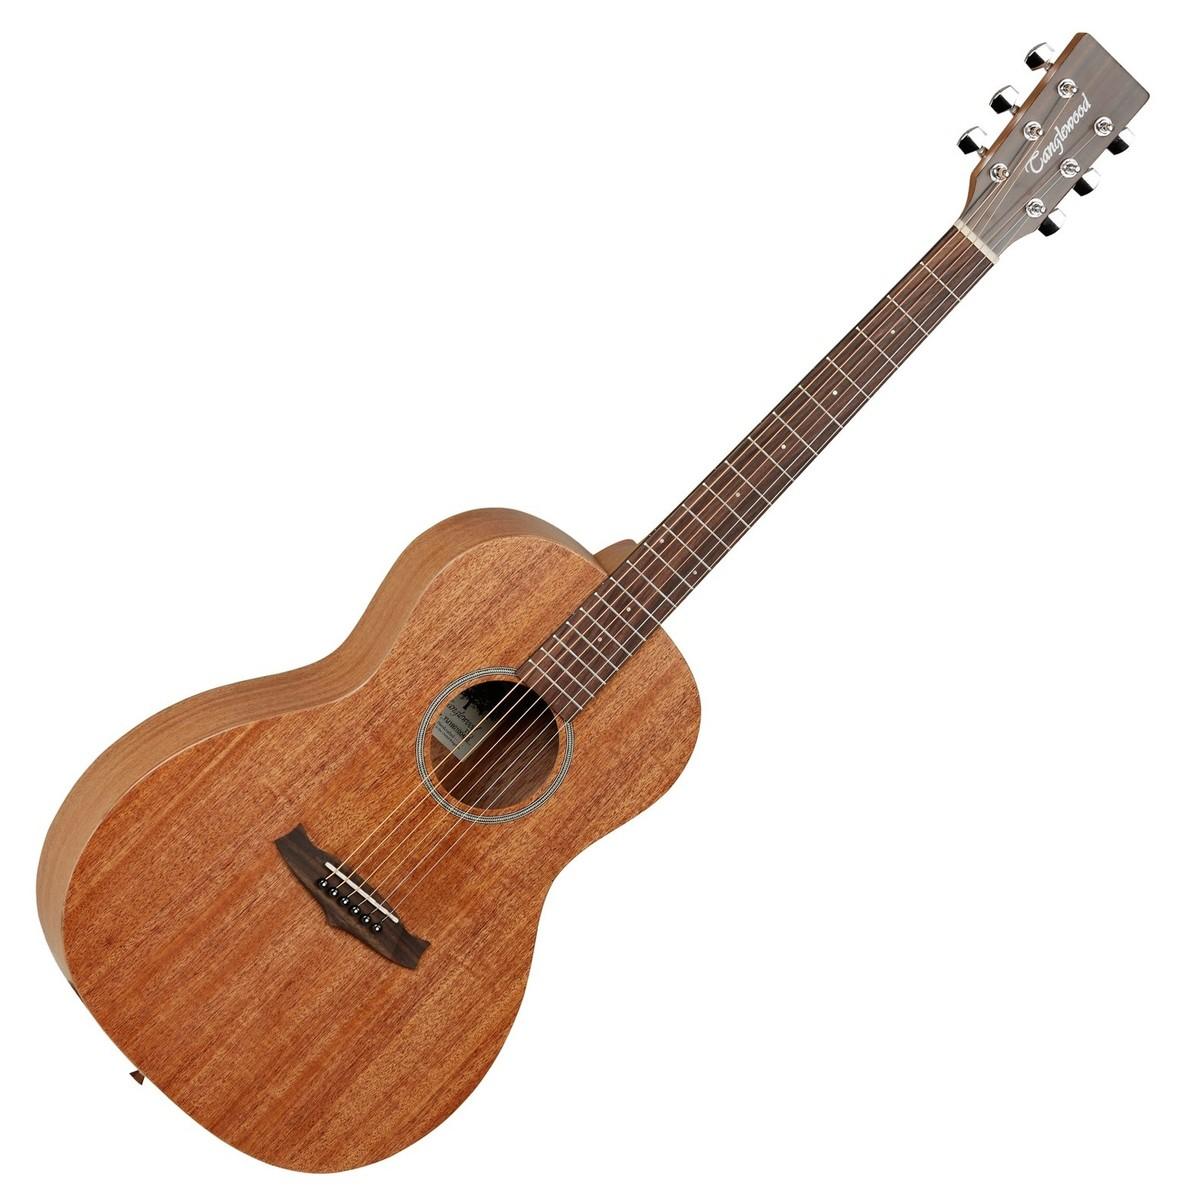 Image of   Tanglewood Winterleaf TW3 Parlour, Western guitar (Naturlig satin)